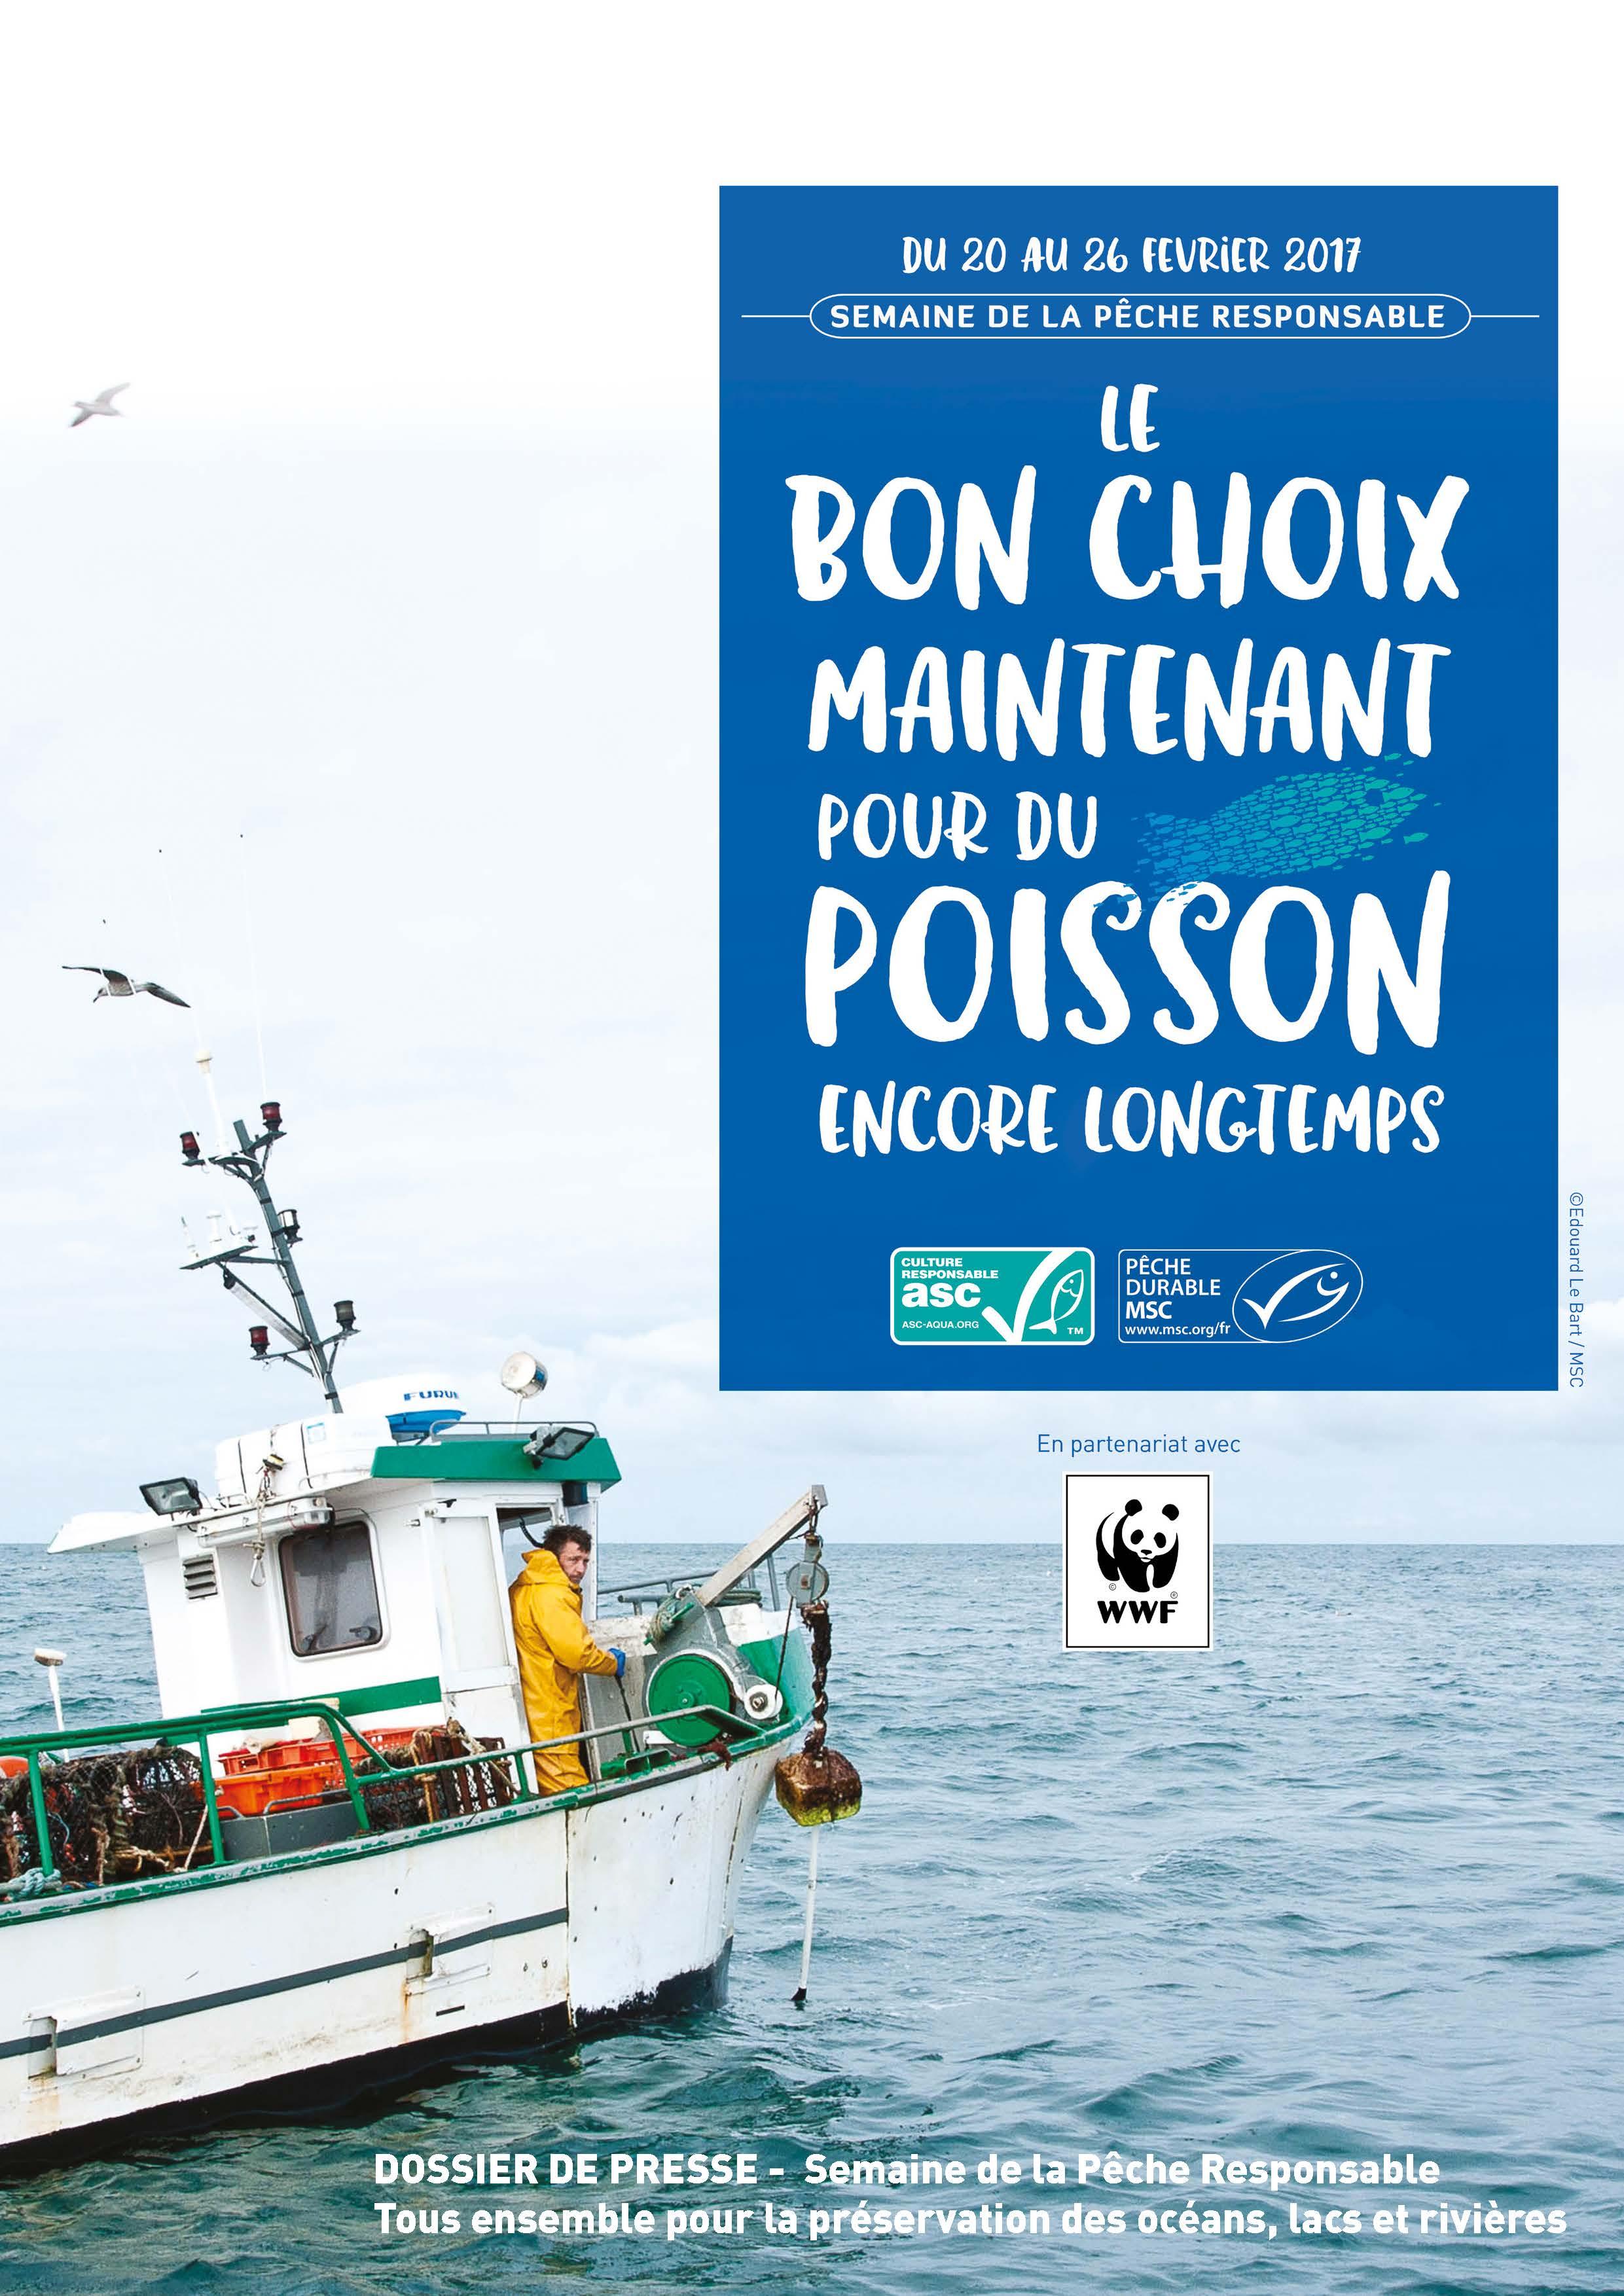 CP semaine de la pêche durable MSC /WWF page 1